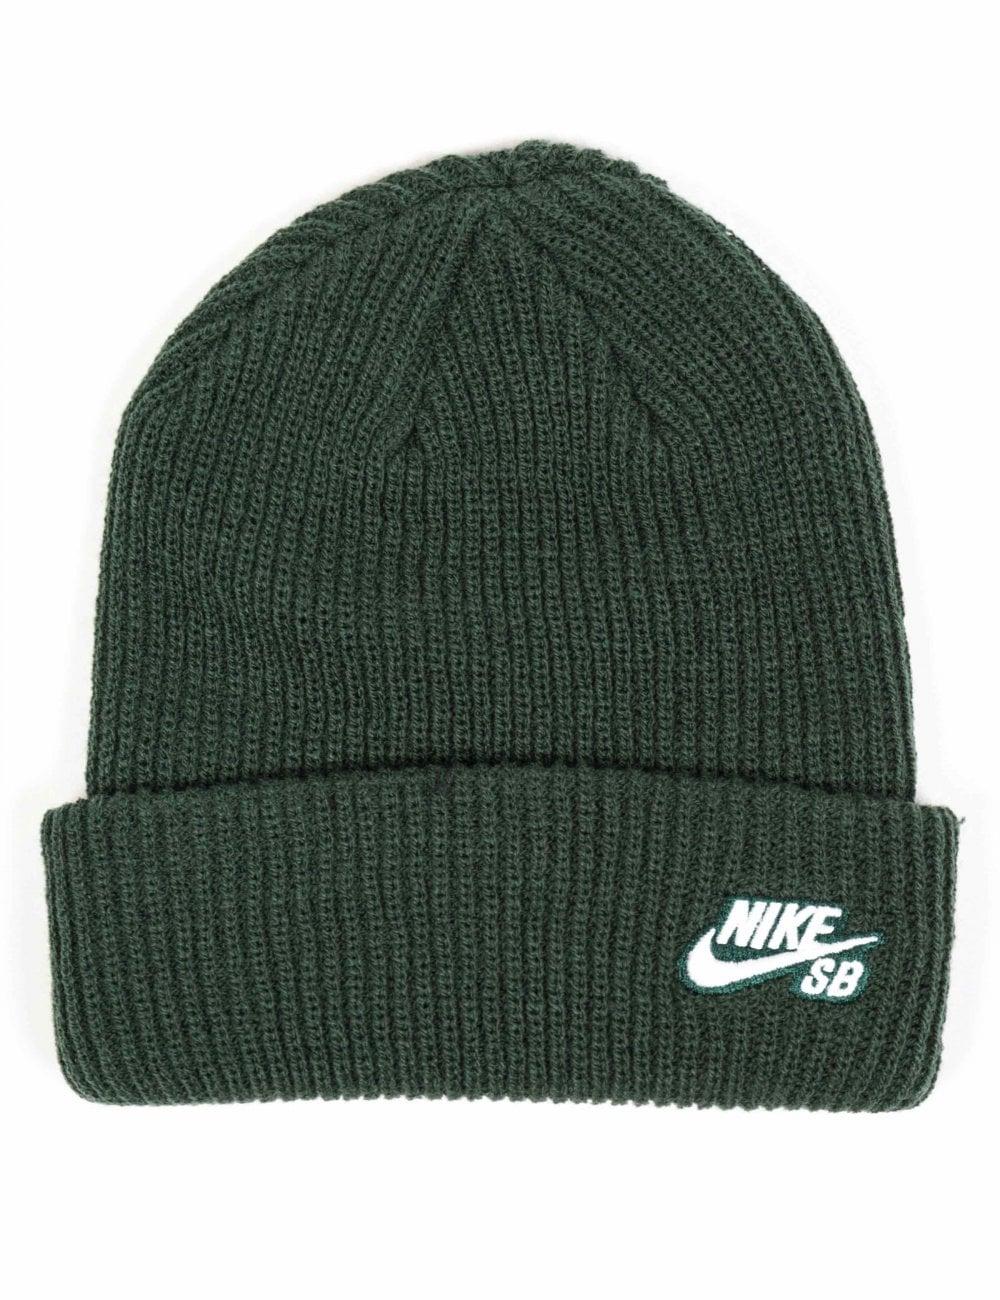 2e2c40bf Nike SB Fisherman Beanie Hat - Midnight Green - Accessories from Fat ...